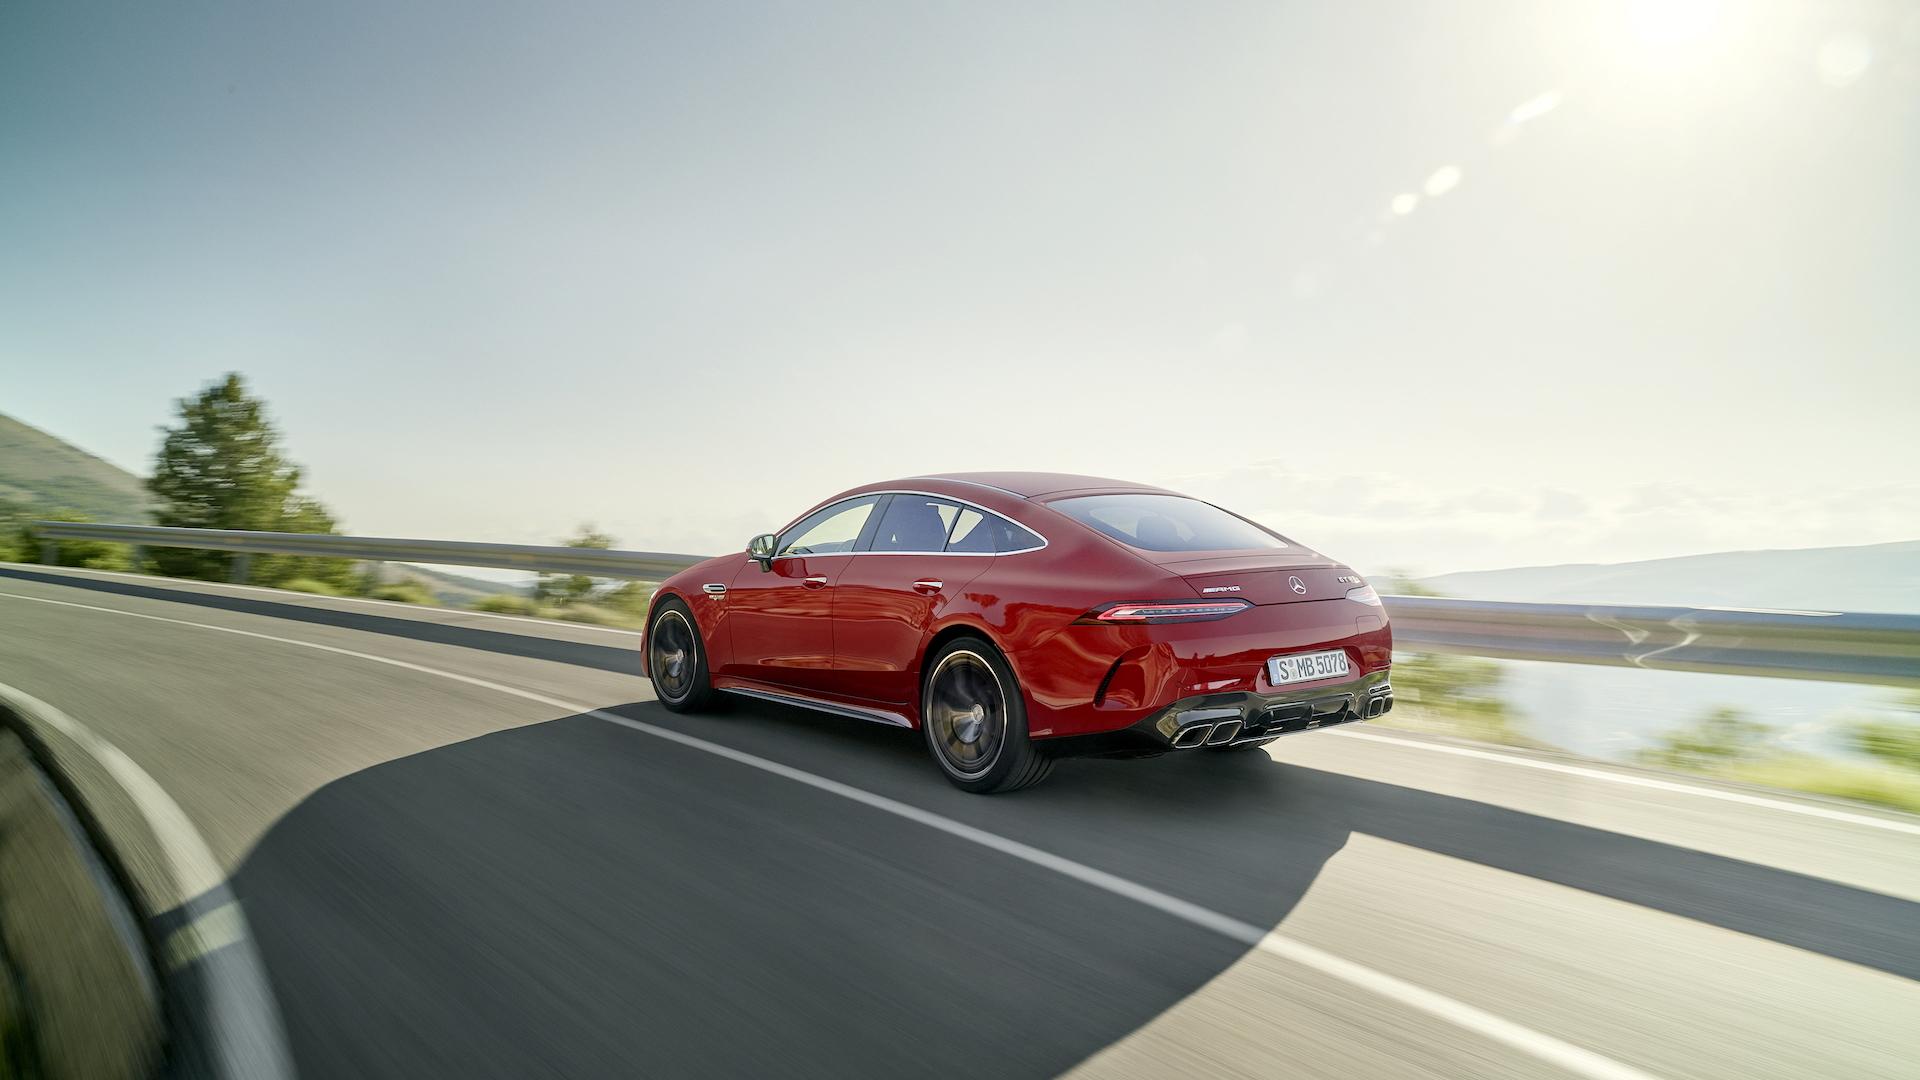 2023 Mercedes-Benz AMG GT 63S E Performance